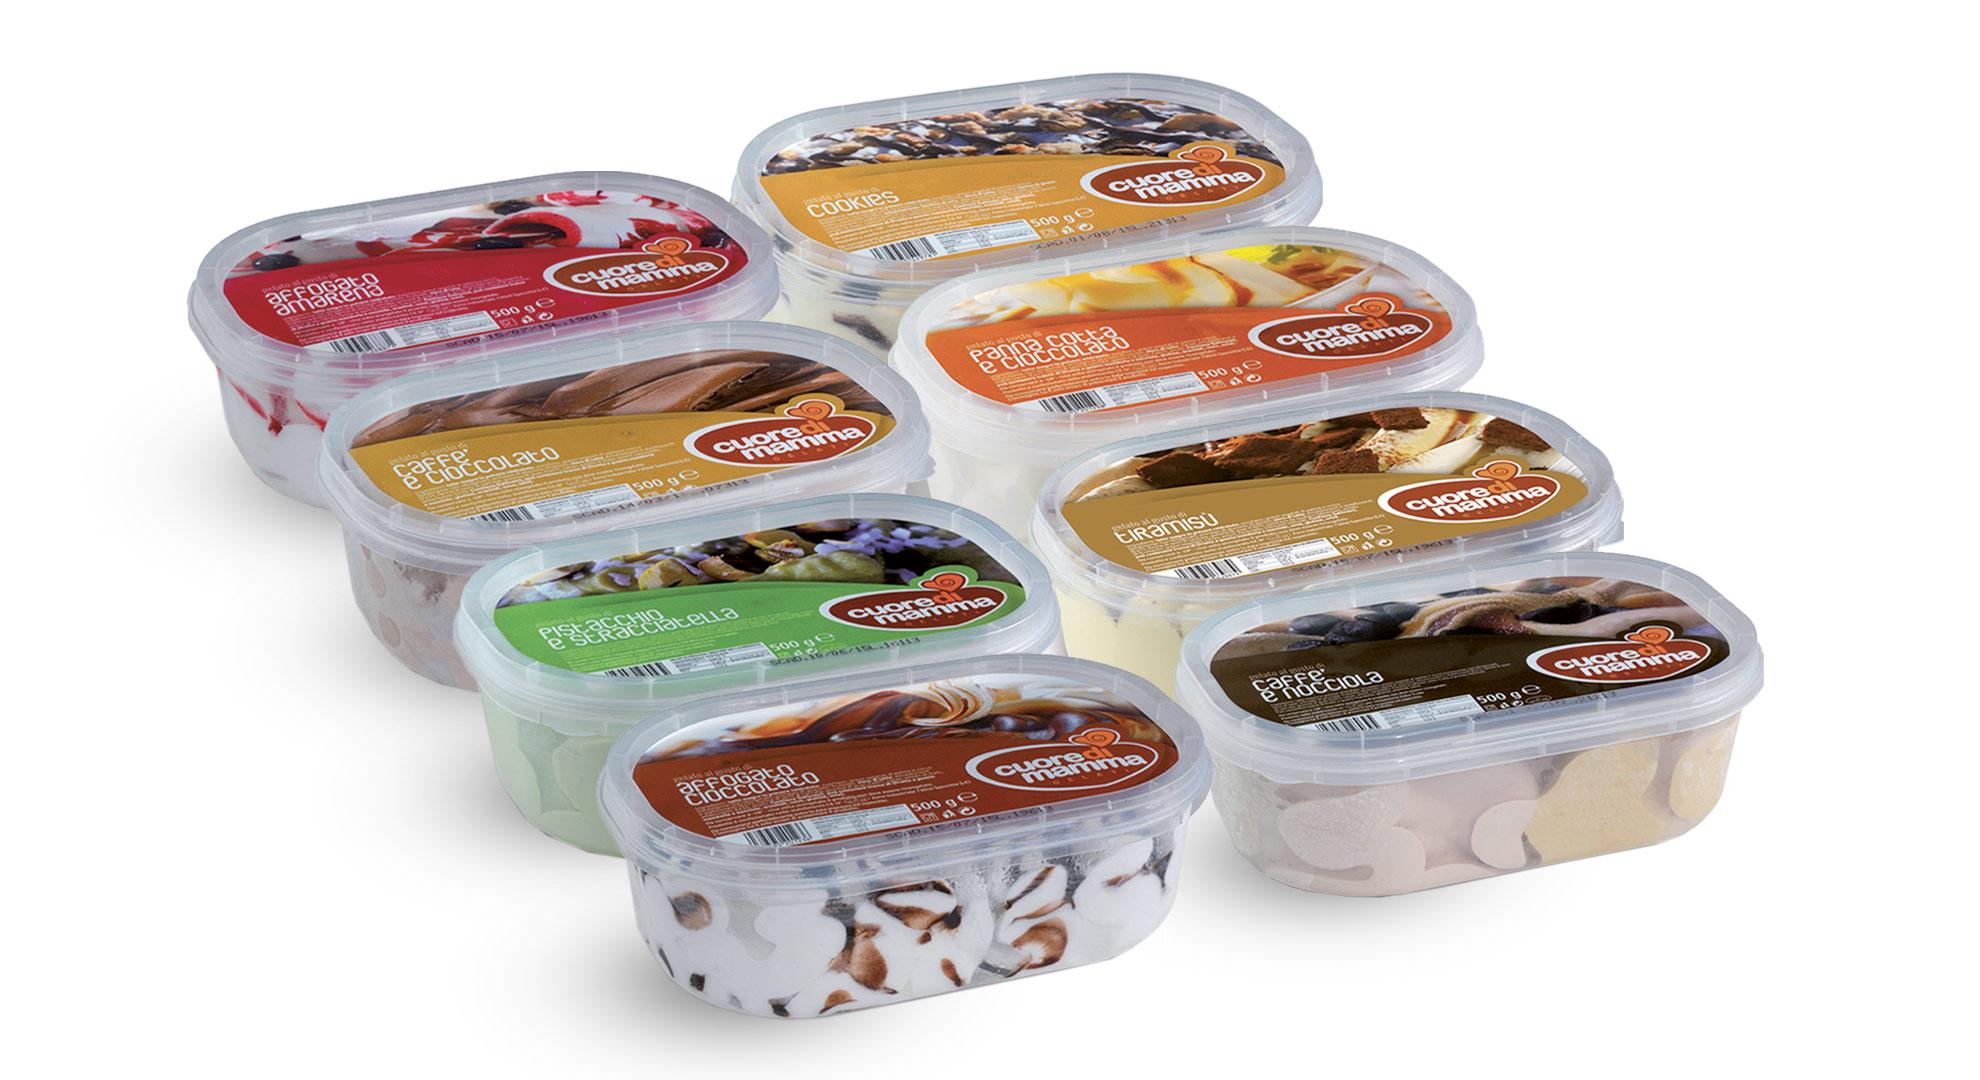 Vaschette gelato da 500 g